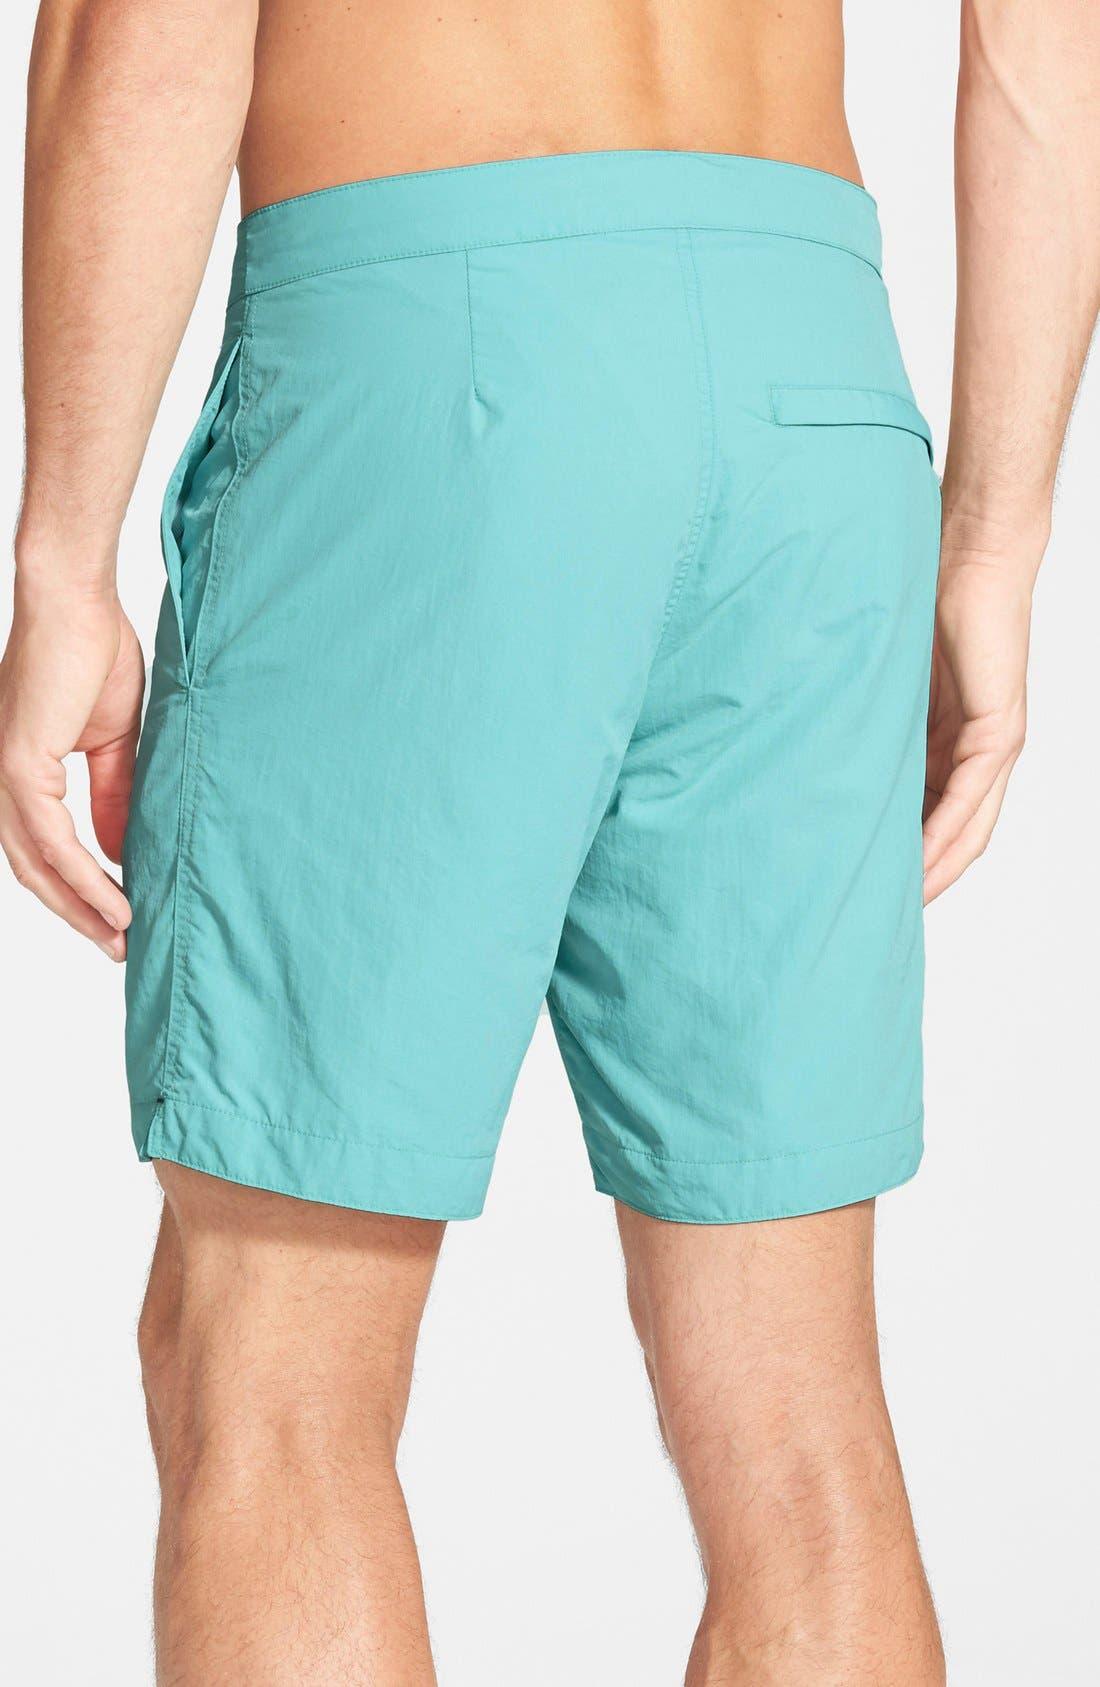 'Aruba - Island' Tailored Fit 8.5 Inch Board Shorts,                             Alternate thumbnail 13, color,